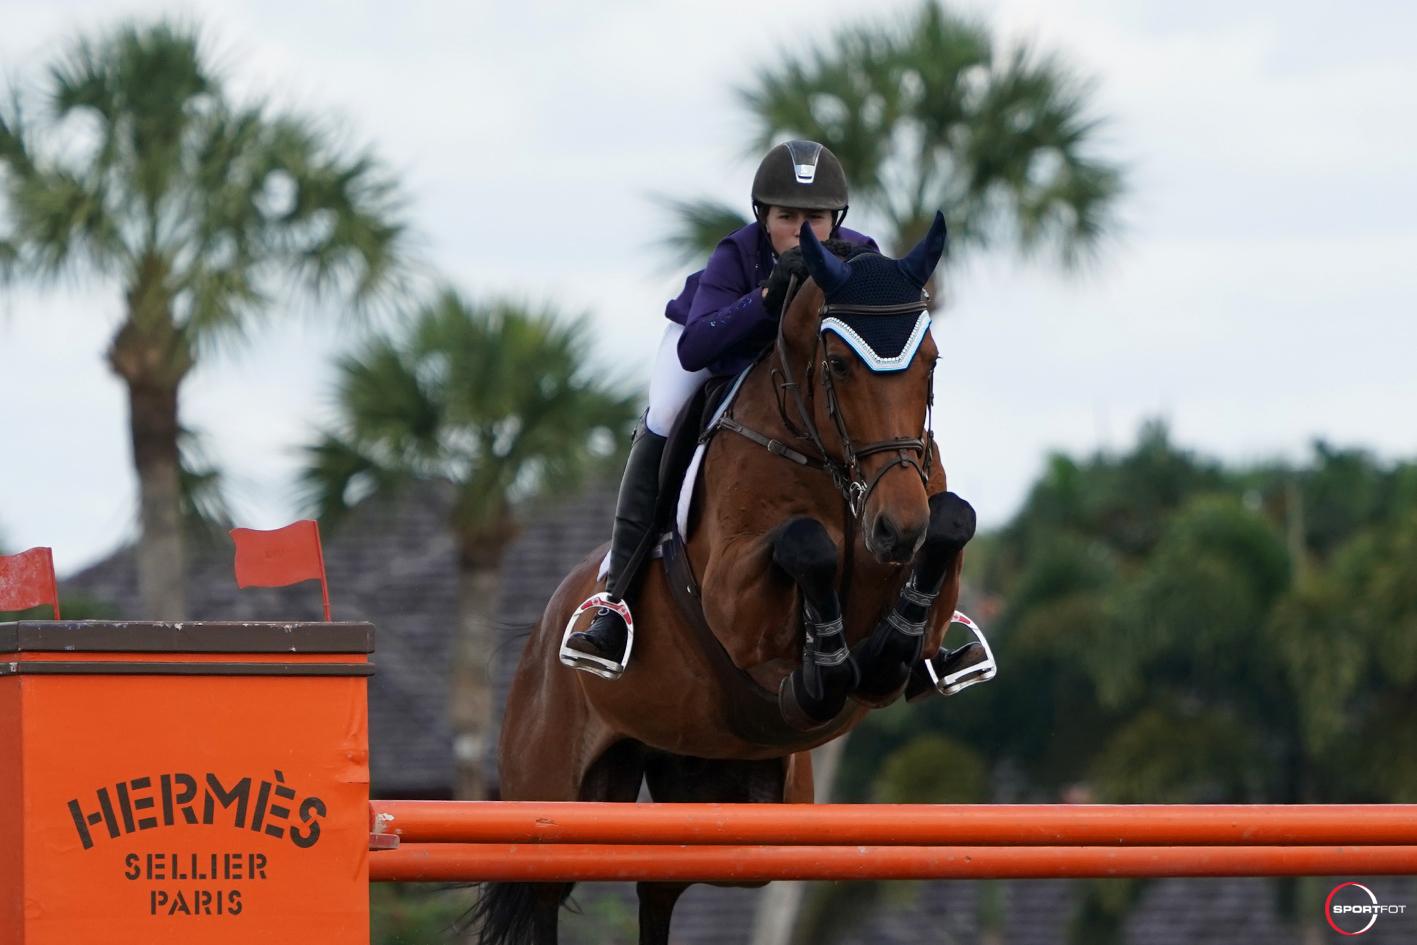 Alexanne Thibault and Chacco Prime U25 43104456 Sportfot